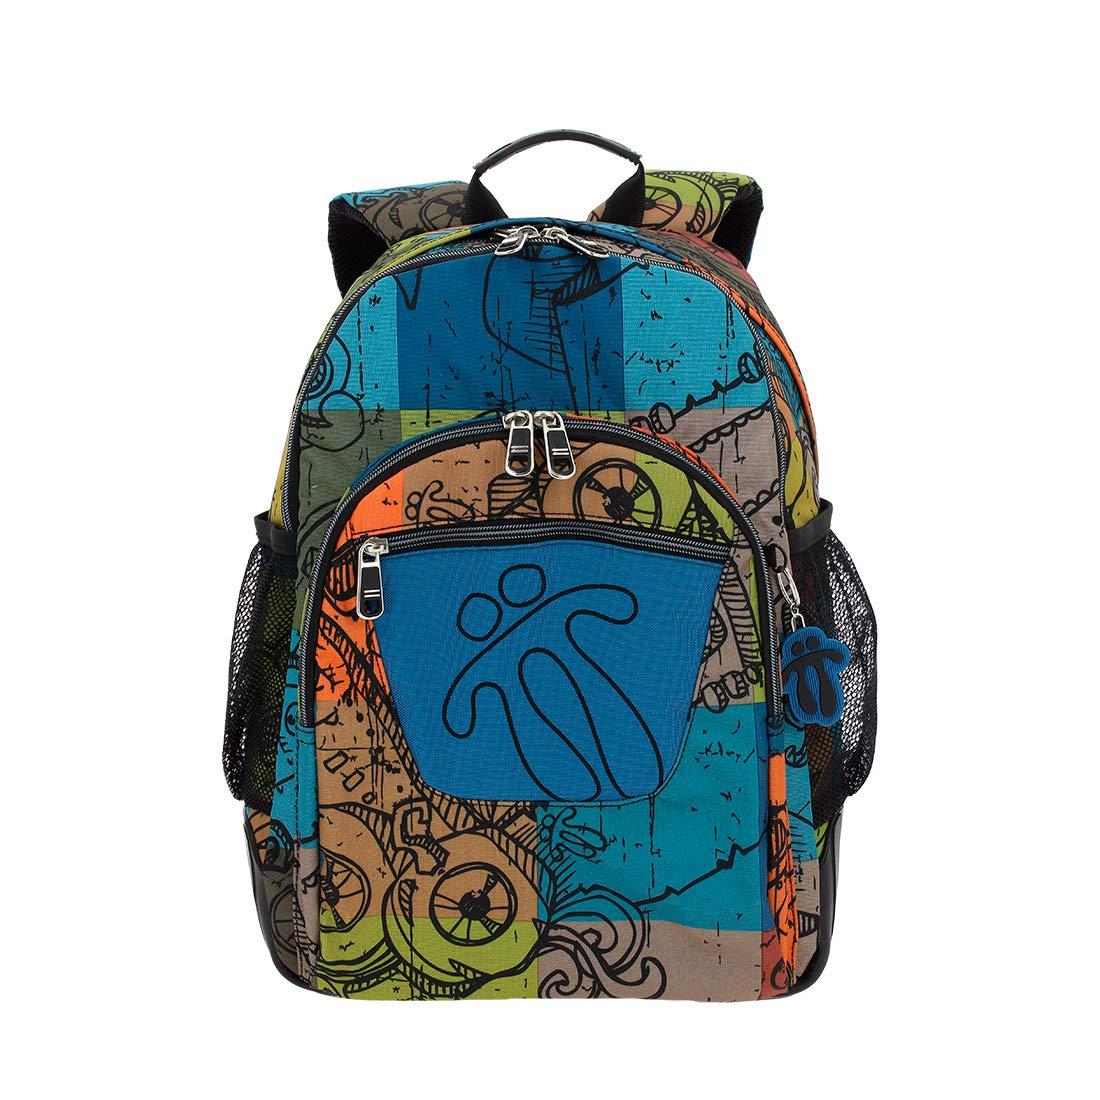 TOTTO Schoolバックパック、大きい乳児、バックパックを含むSacàDos Enfants、44 cm、20リットル、色とりどりの(多色) B073CYFZWT